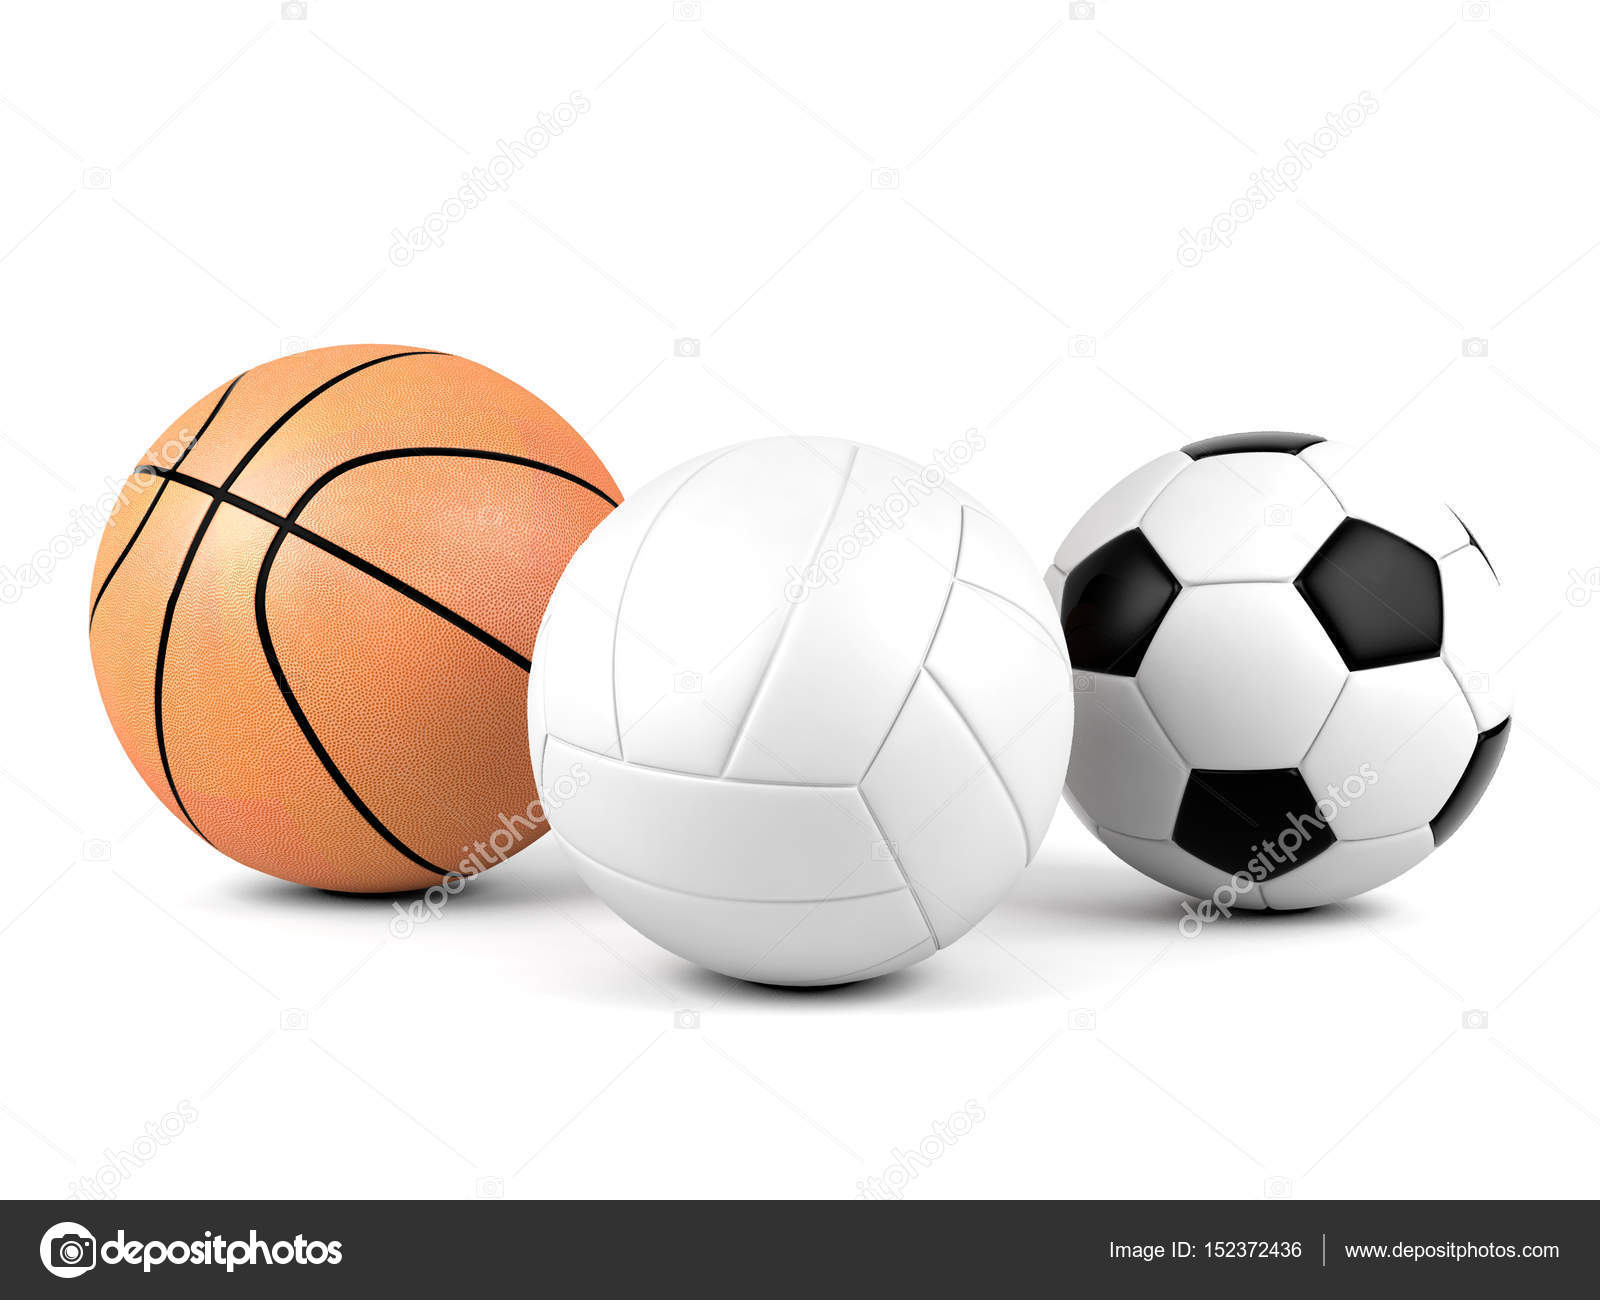 Balones De Fútbol Deportes Fondos De Pantalla Gratis: Pelota De Baloncesto 3d: Imagenes De Balones De Baloncesto